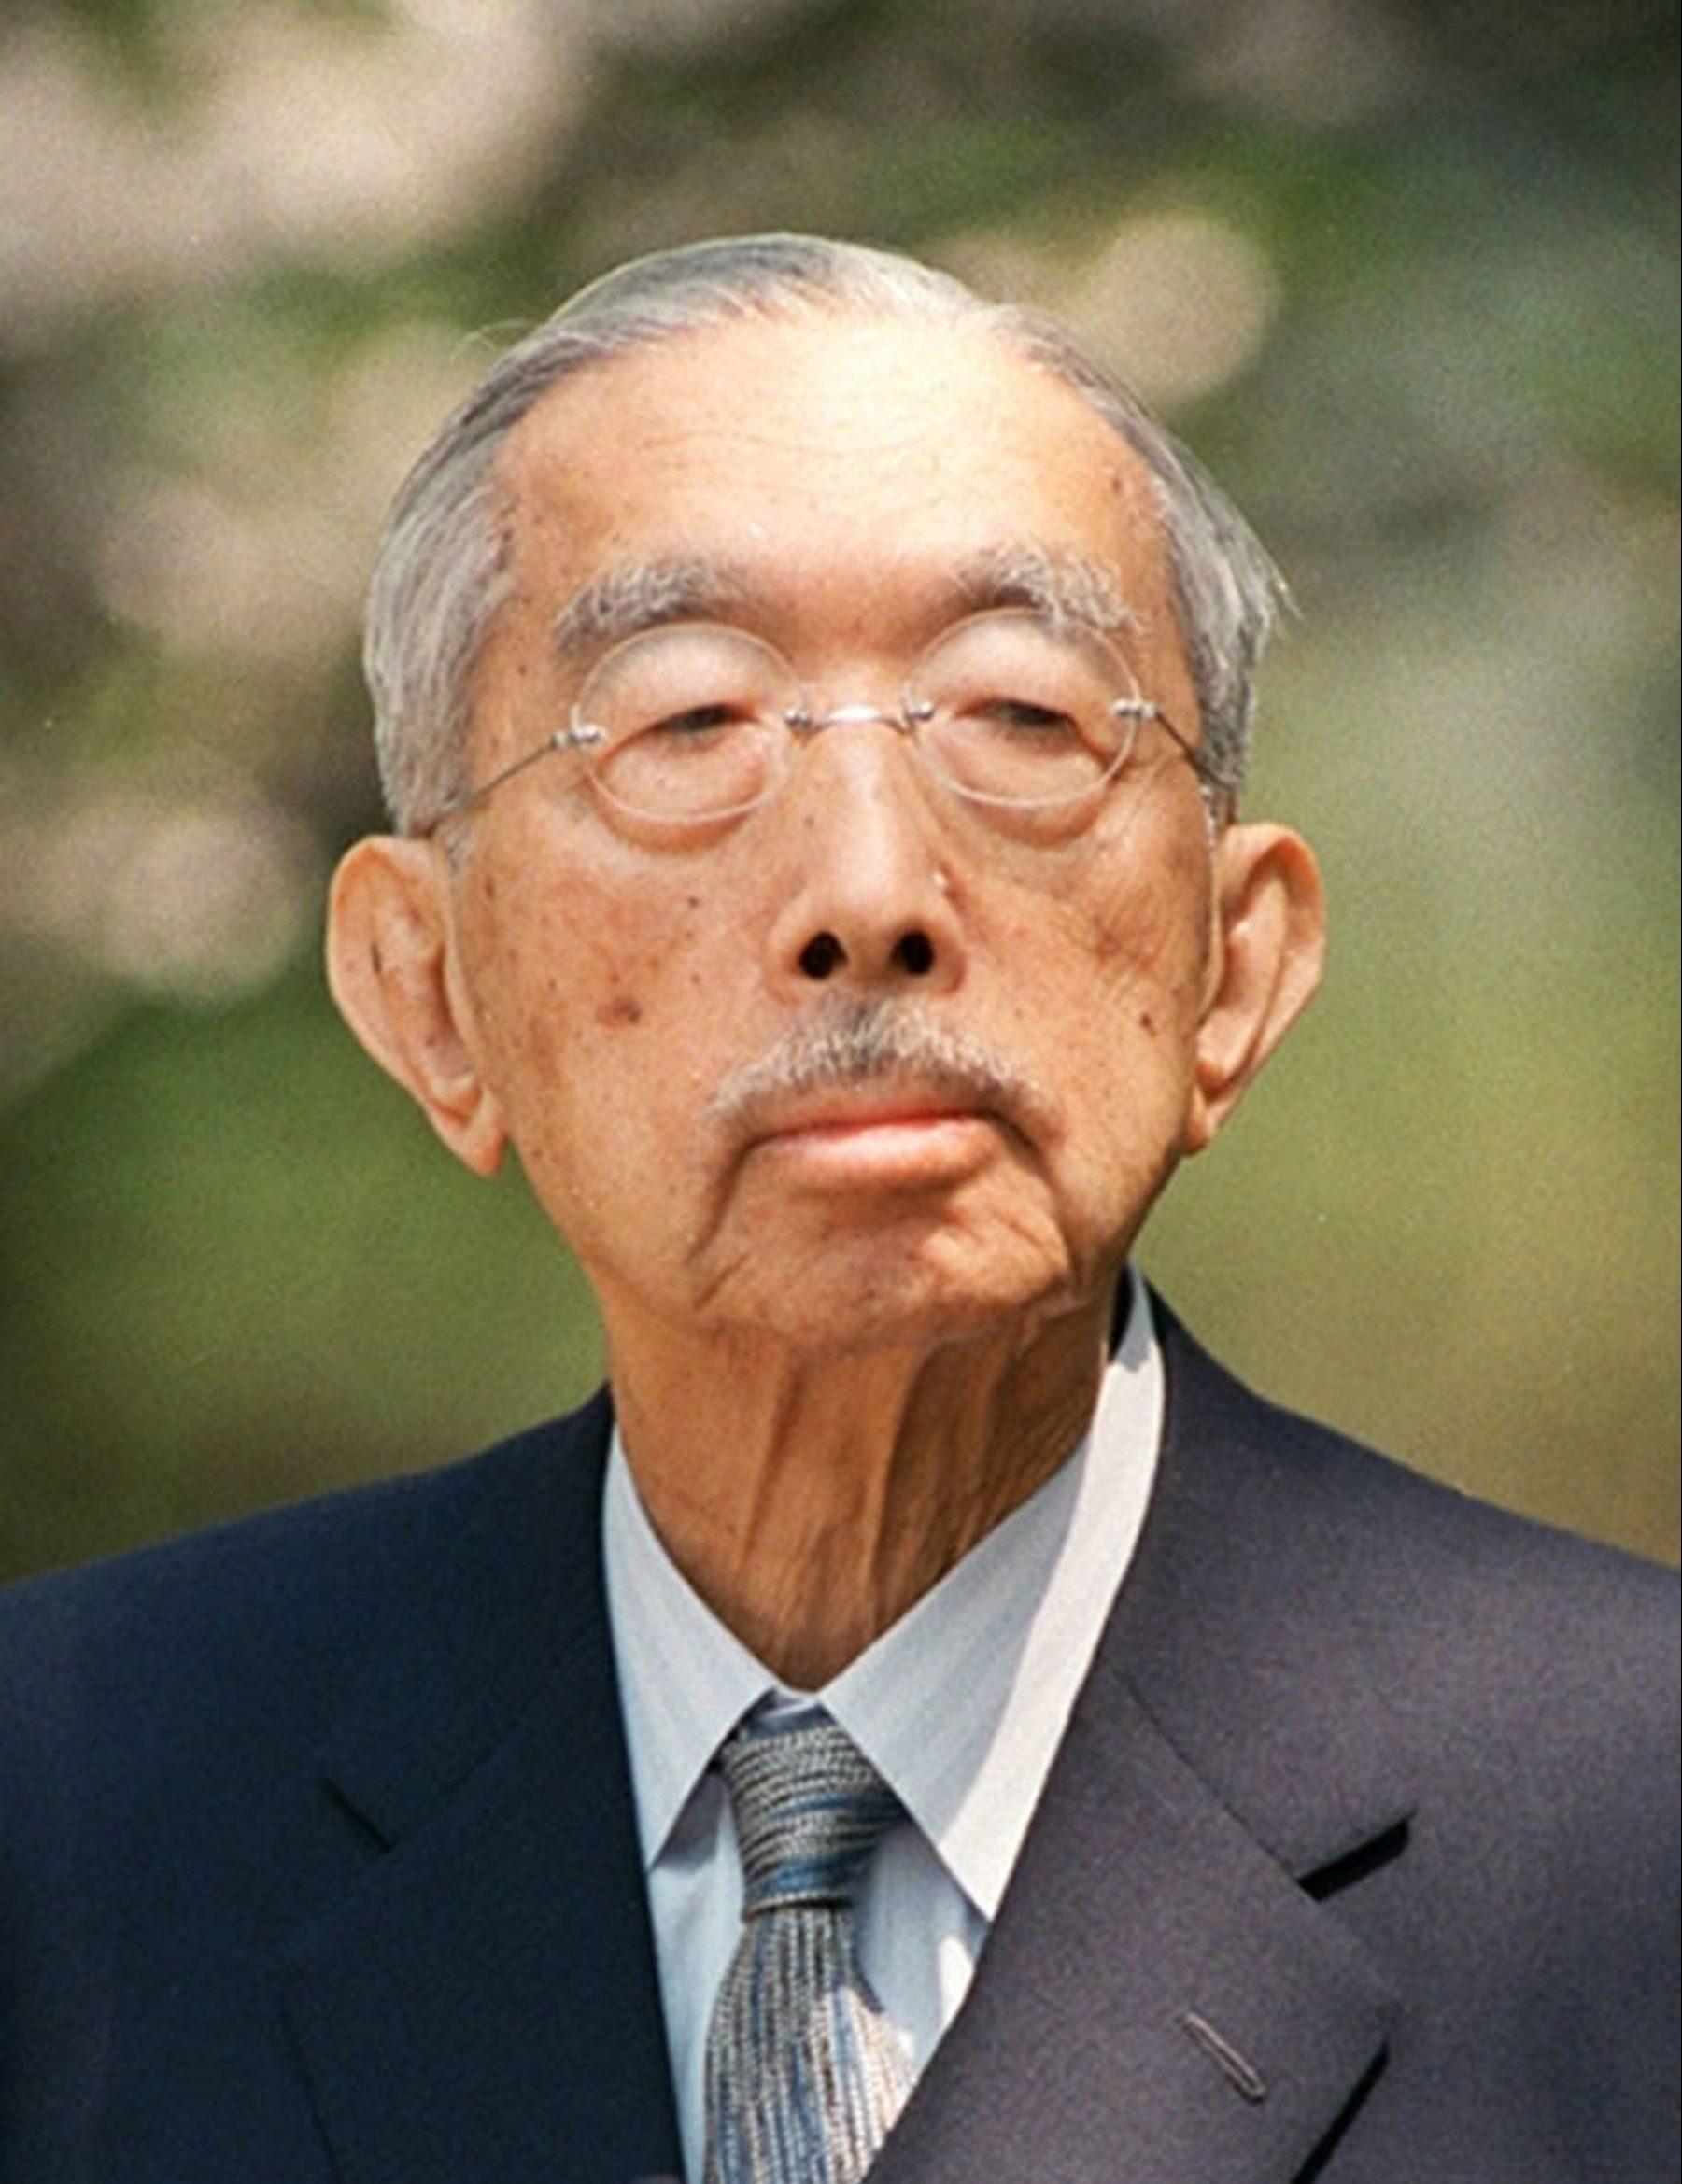 Emperor Showa Favored Japans Rearmament, Documents Reveal 005